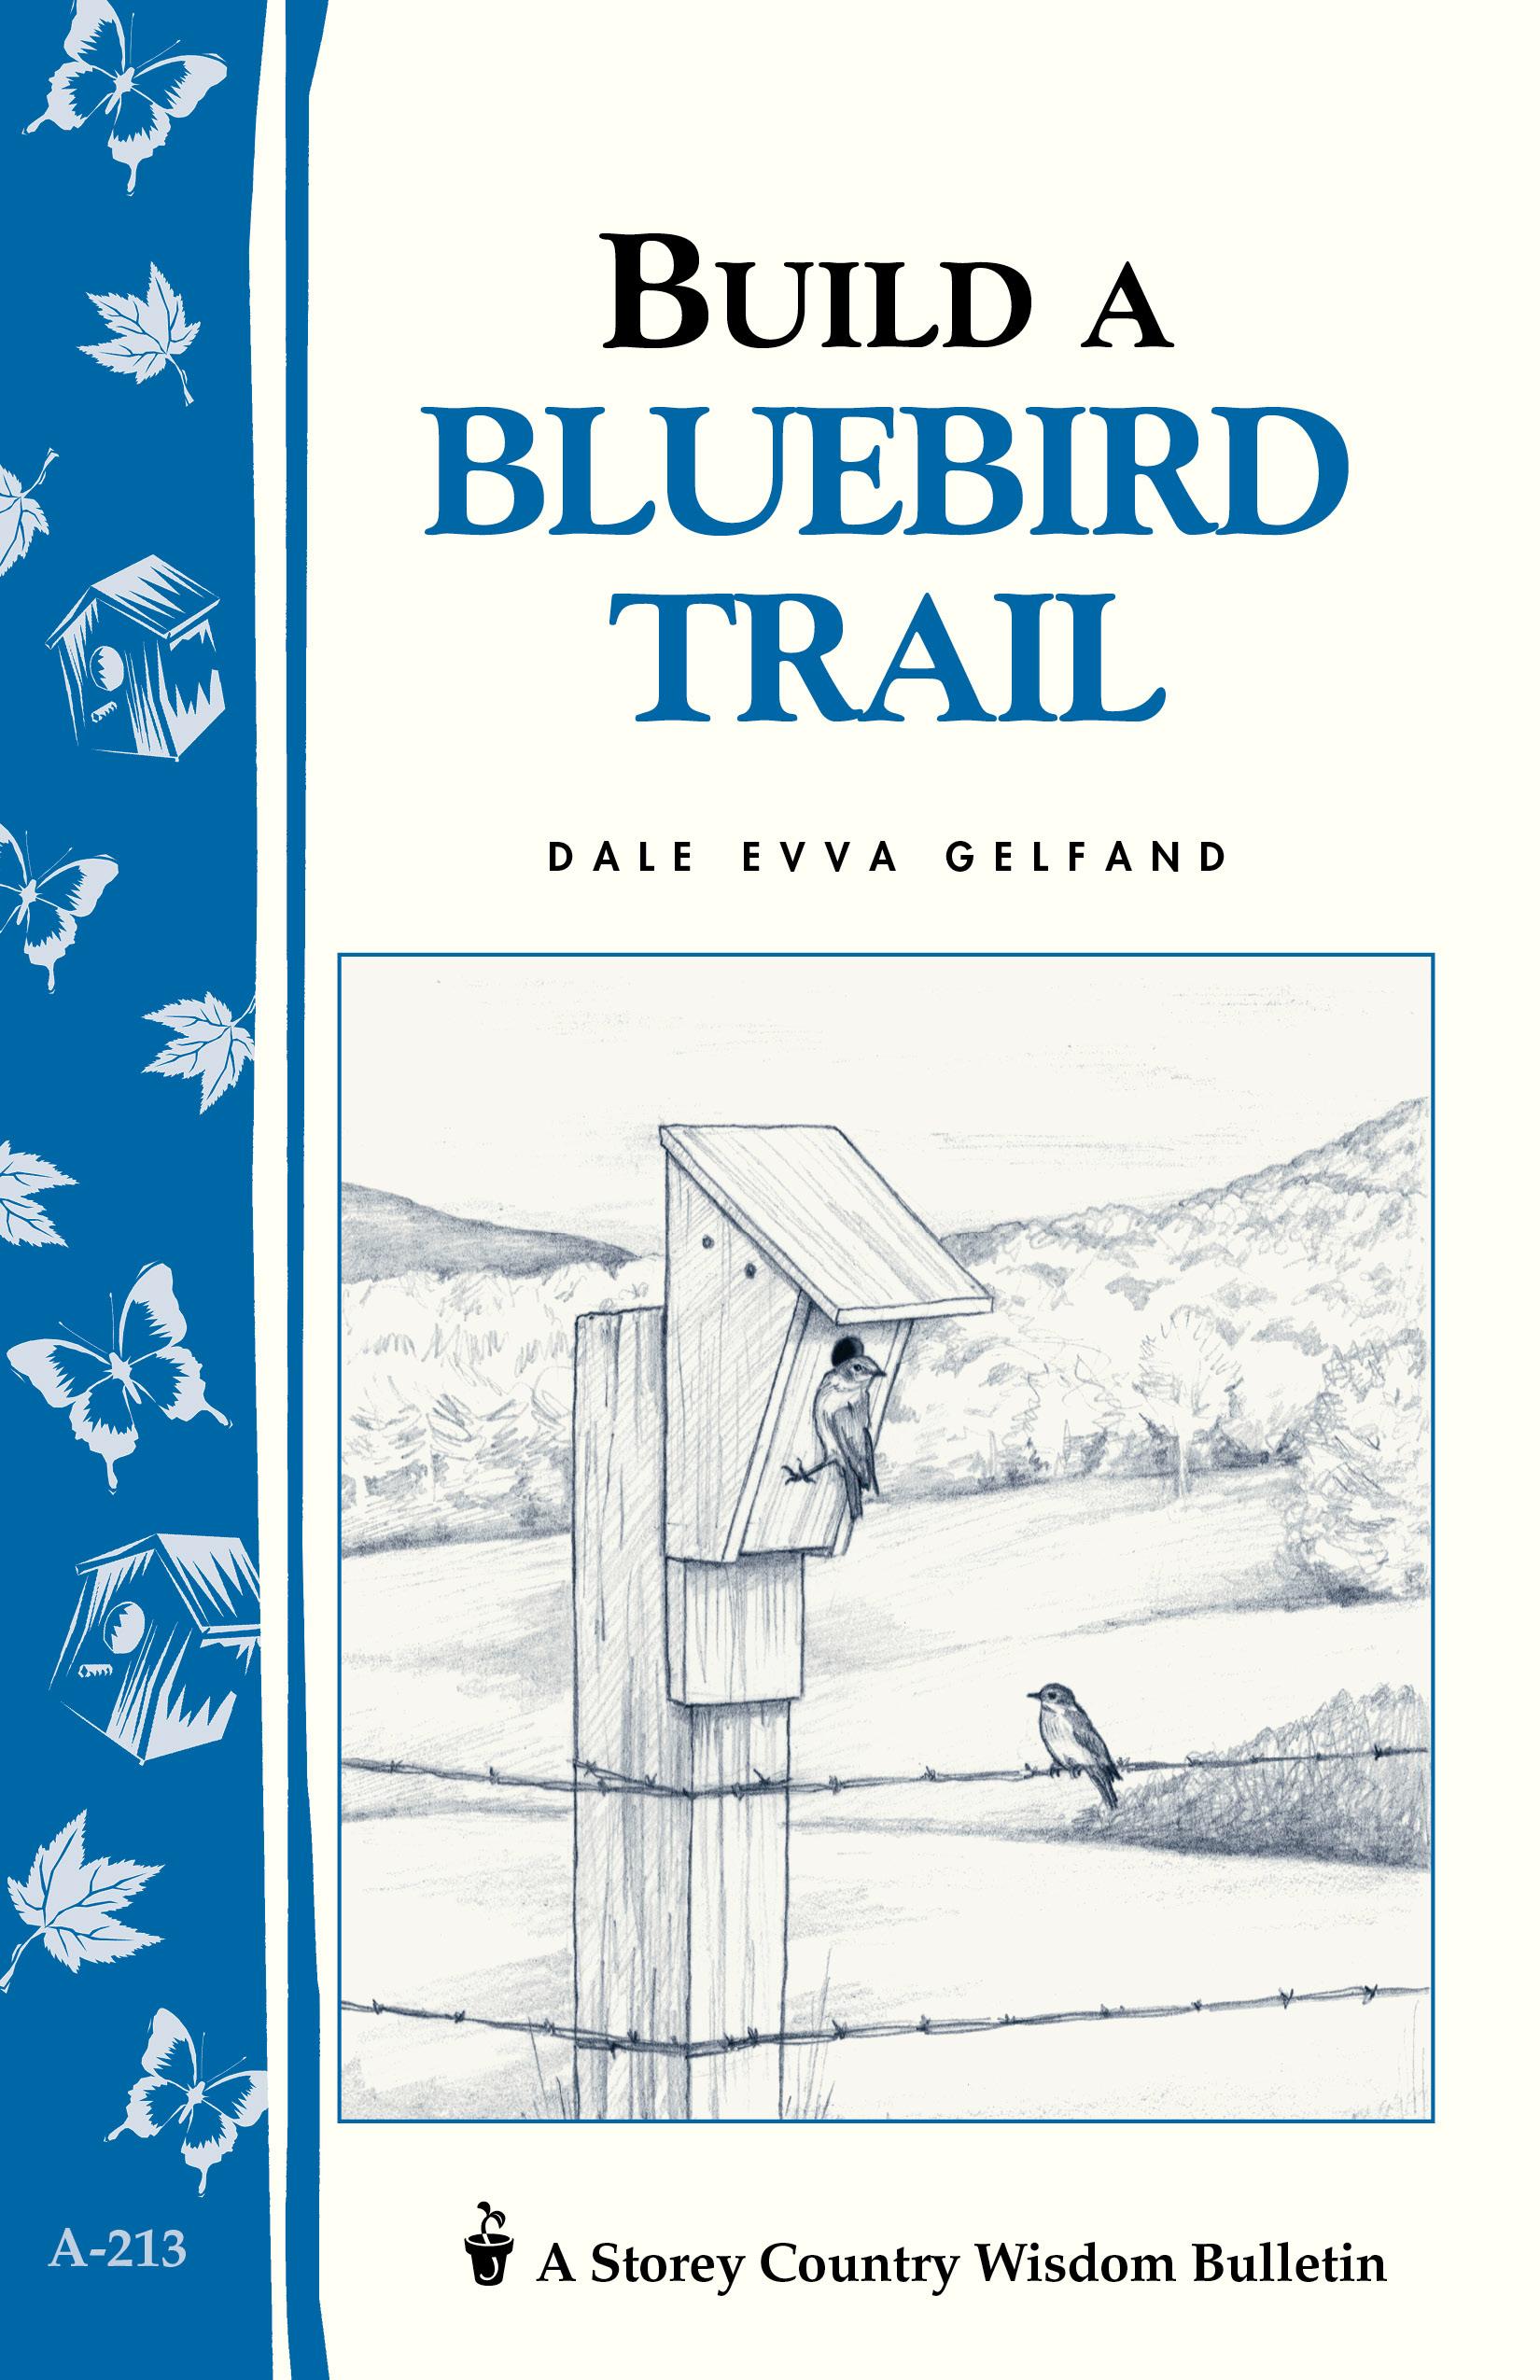 Build a Bluebird Trail Storey's Country Wisdom Bulletin A-213 - Dale Evva Gelfand